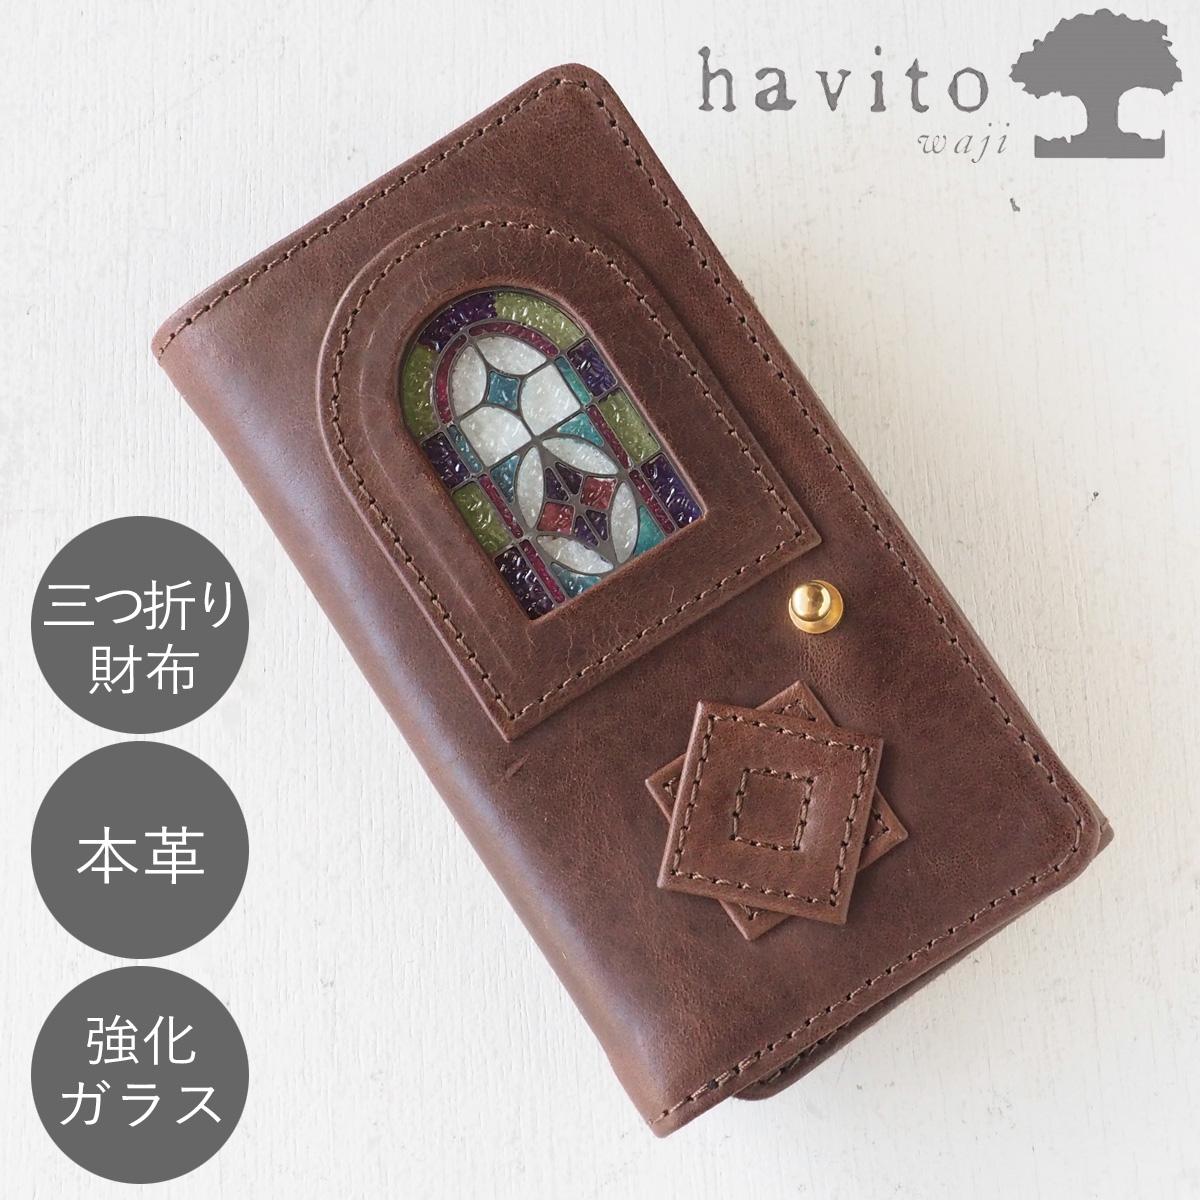 havito(ハビト) by waji(ワジ) glart 三つ折り財布 デザイン硝子×オイルレザー アンティークドア ブラウン [H0212-BR]